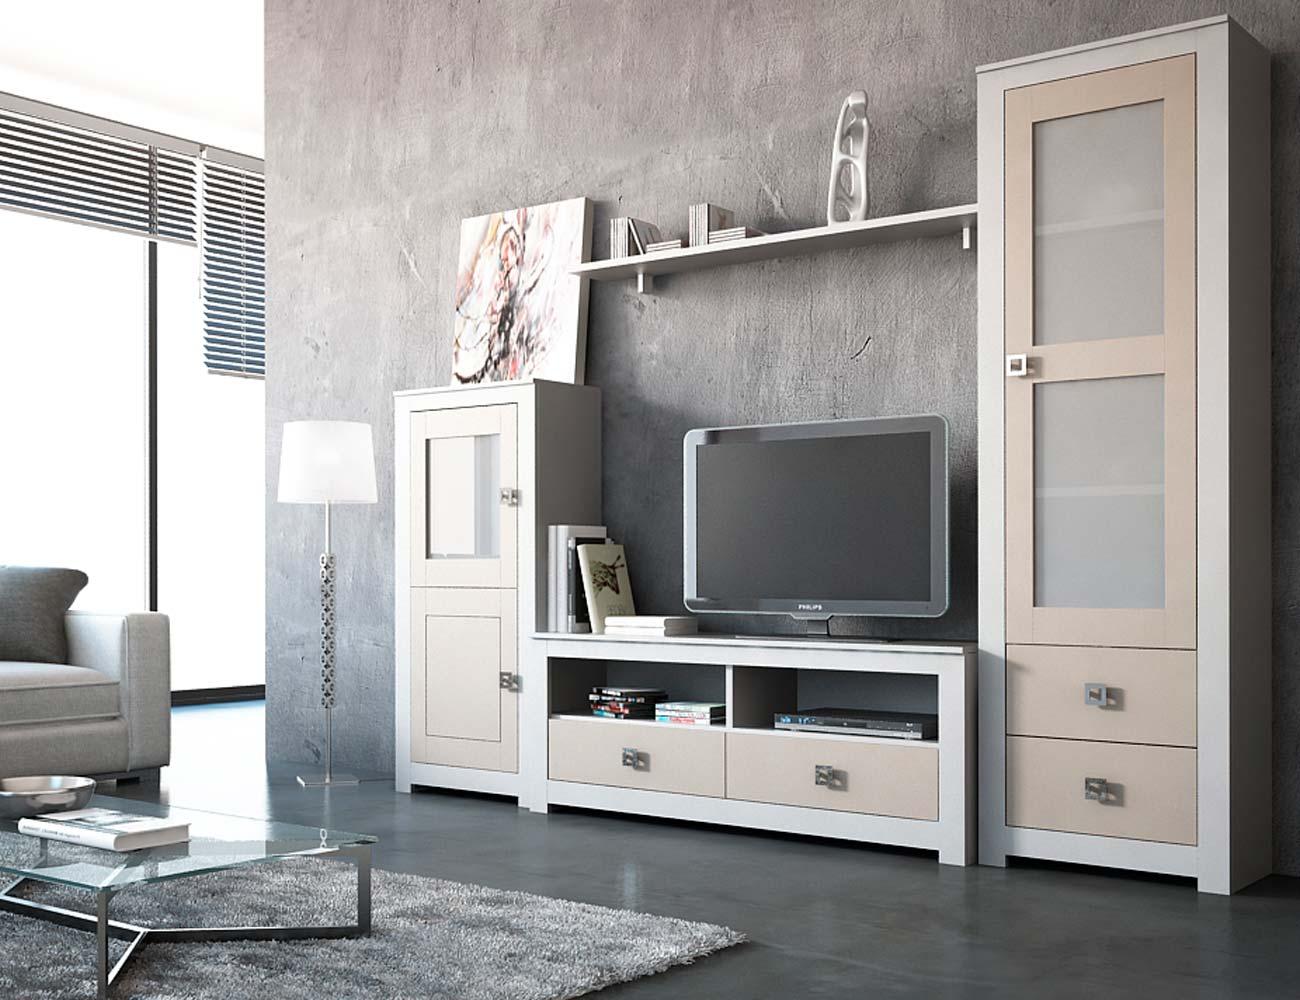 2 mueble salon modular lacado blanco piedra madera dm3